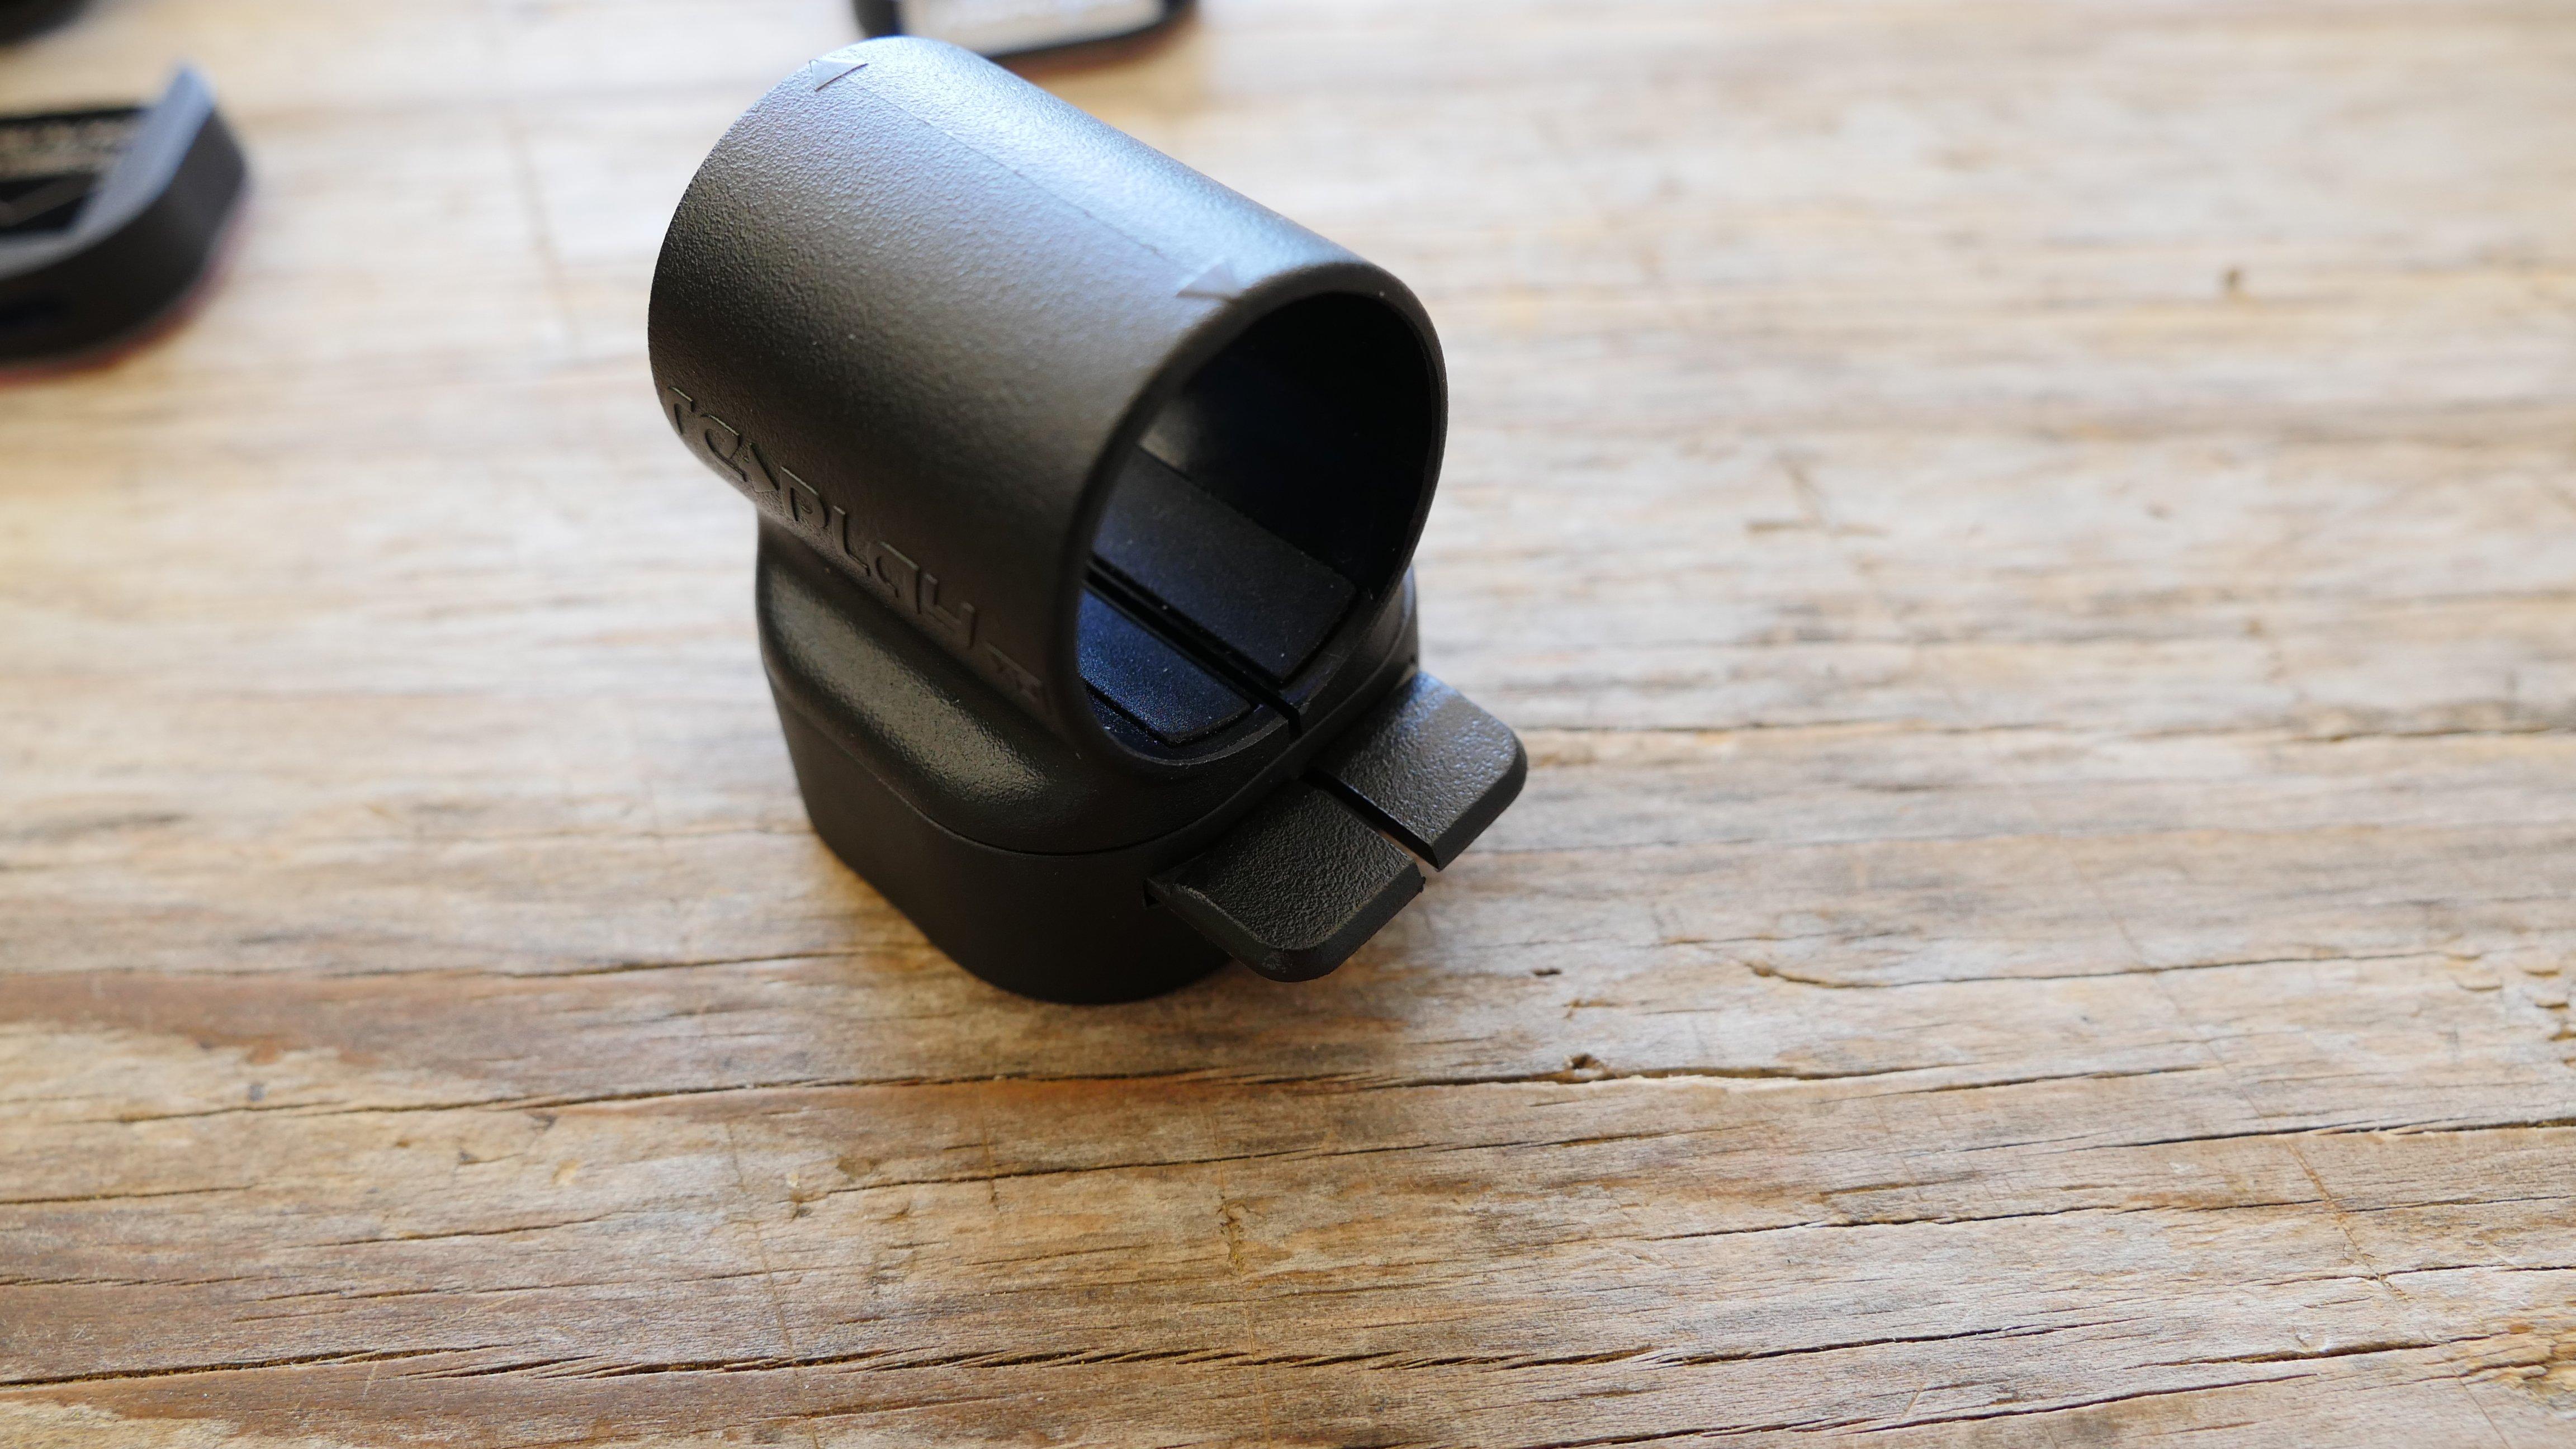 P1020603